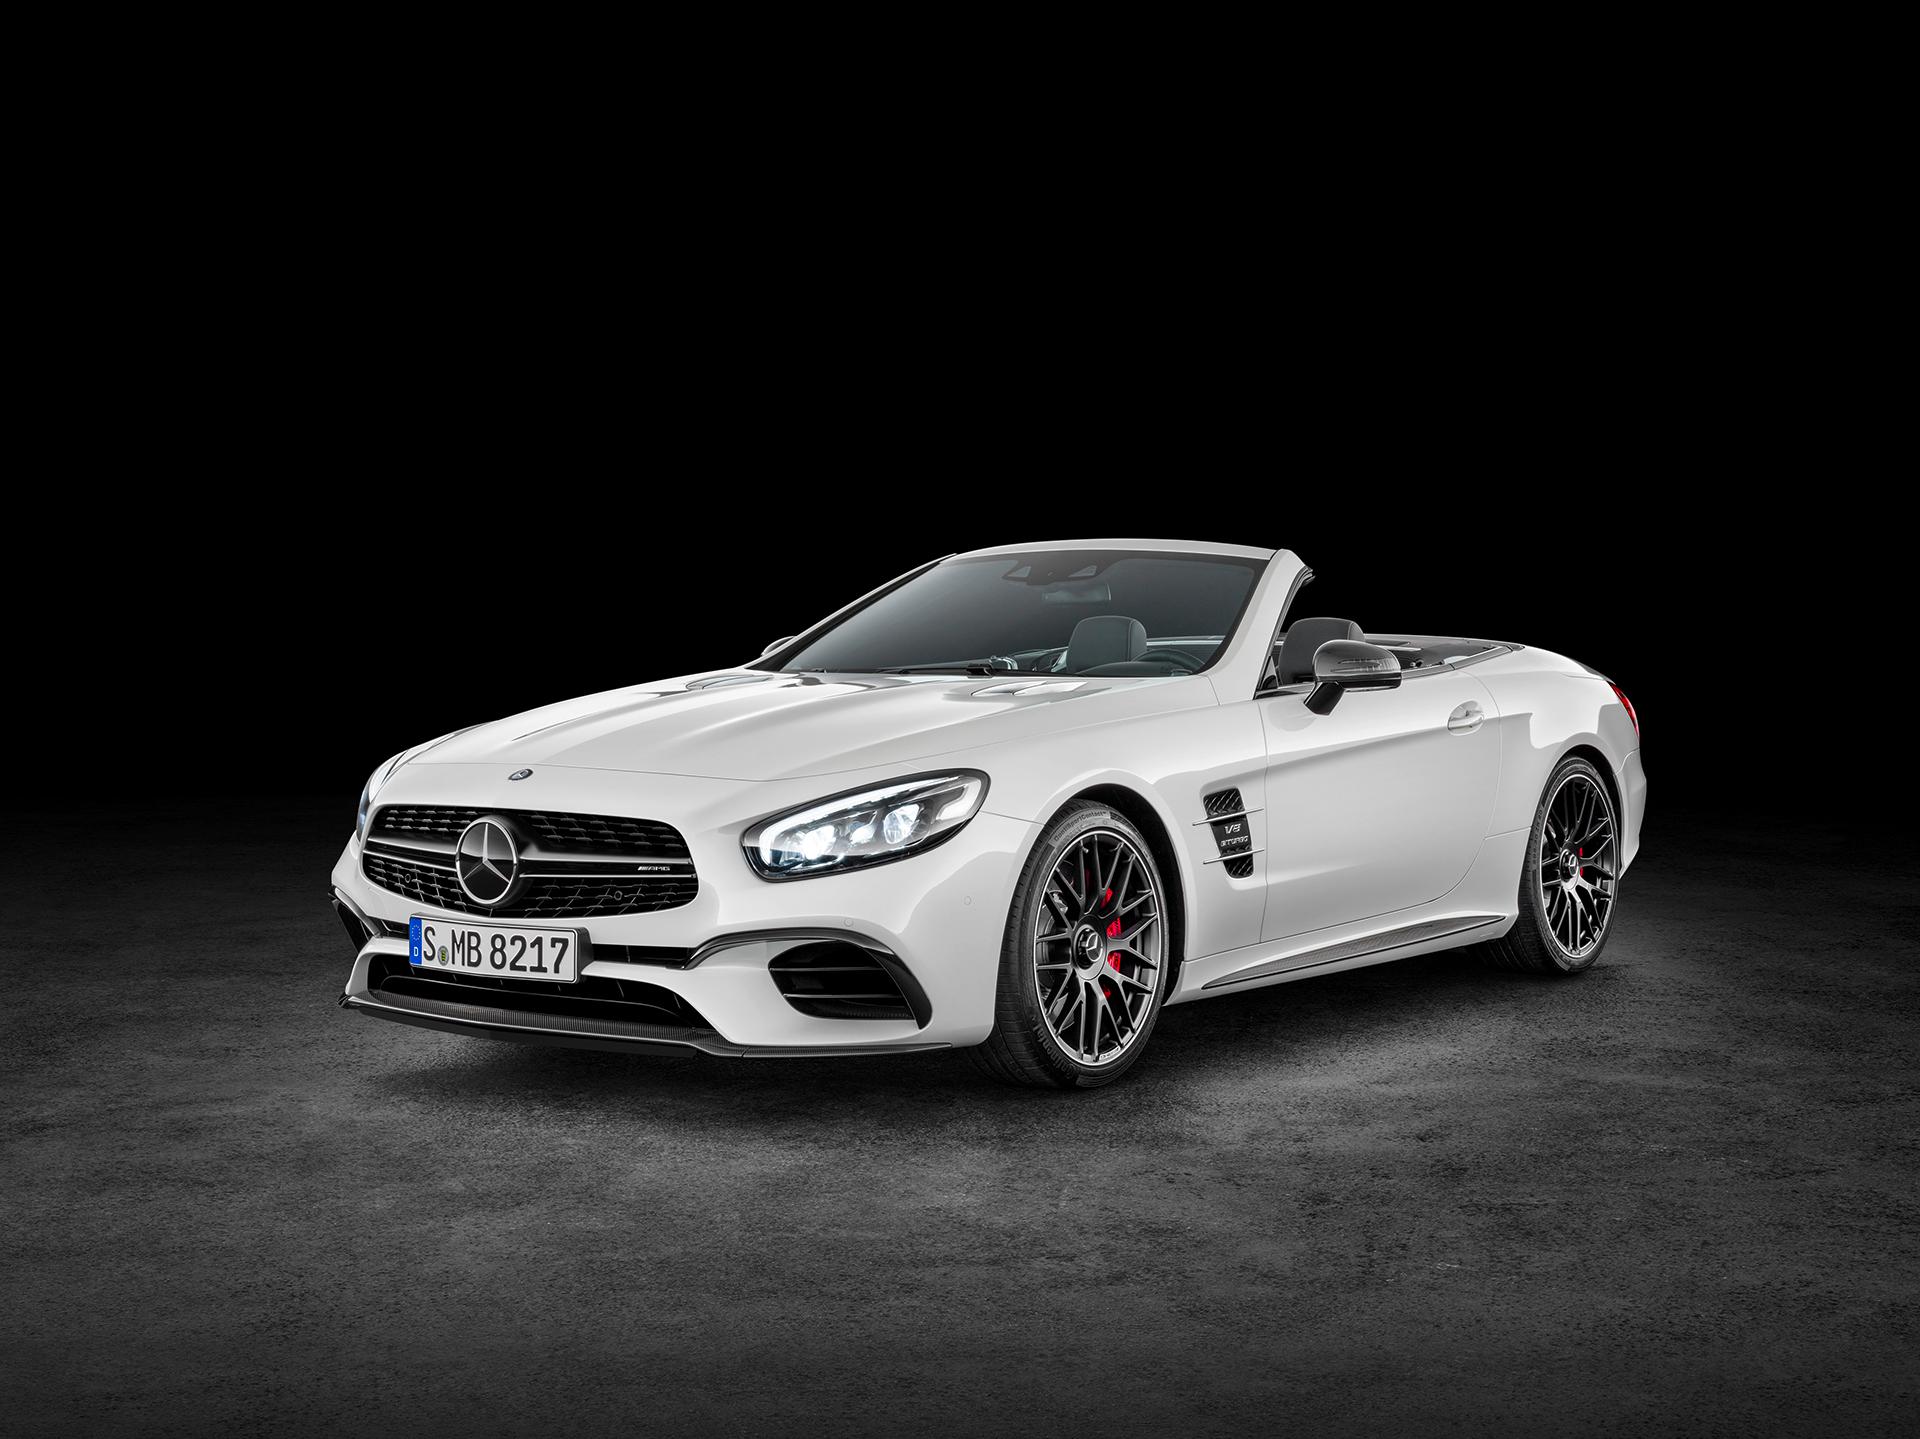 Mercedes-Benz SL AMG - 2016 - profil avant / front side-face